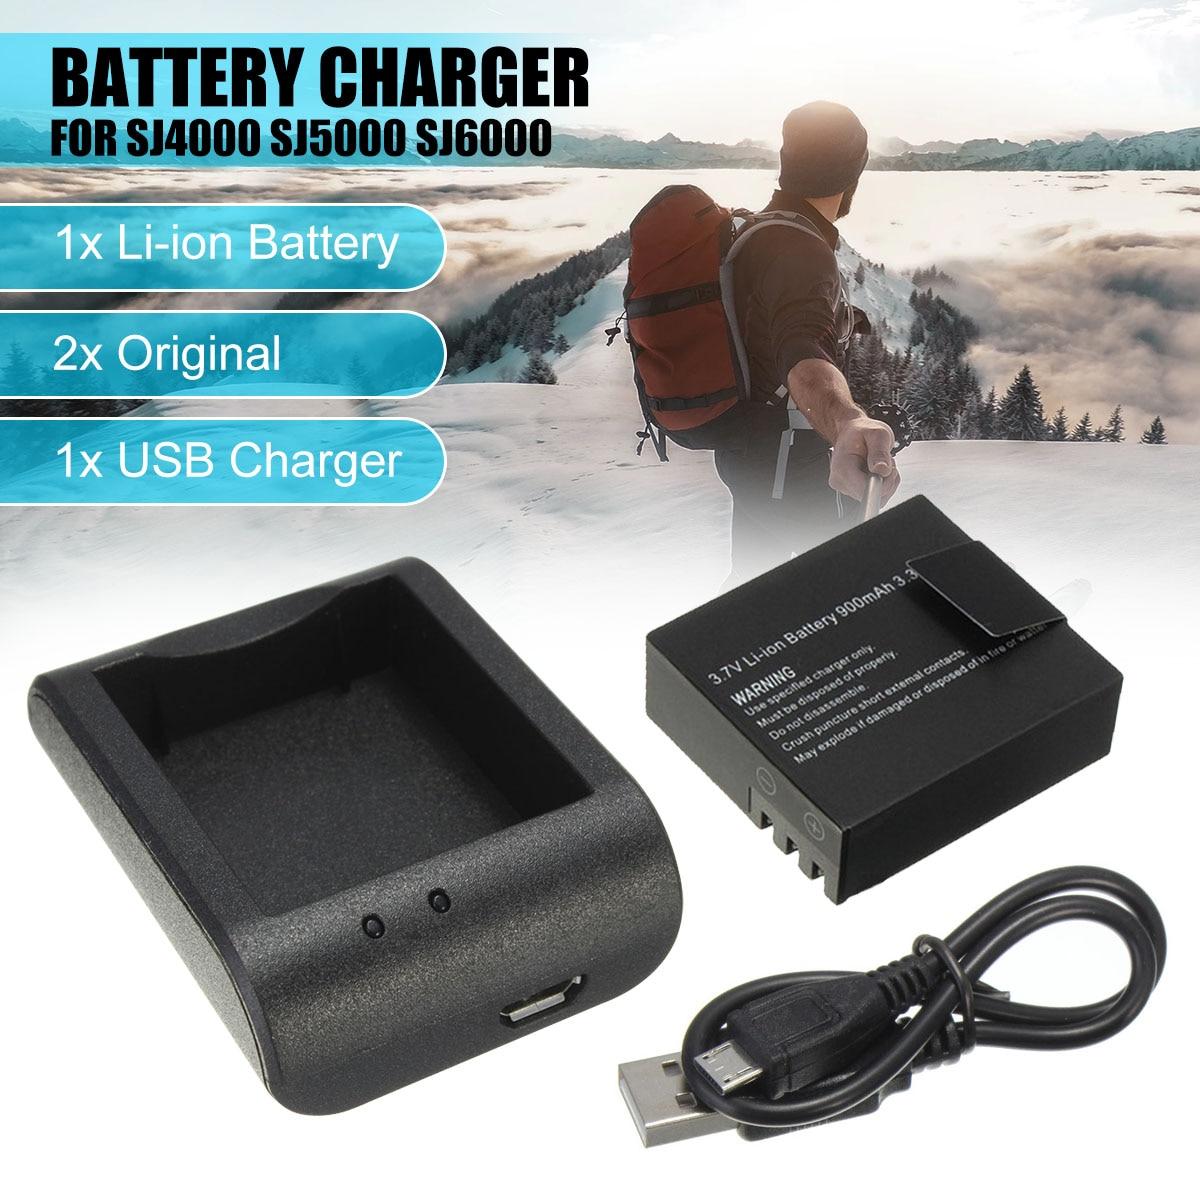 2x3,7 v 900 mah Li-Ion Batterie + USB Kabel Desktop Ladegerät Lade Für SJ4000 SJ5000 SJ6000 Action Sport kamera DVR